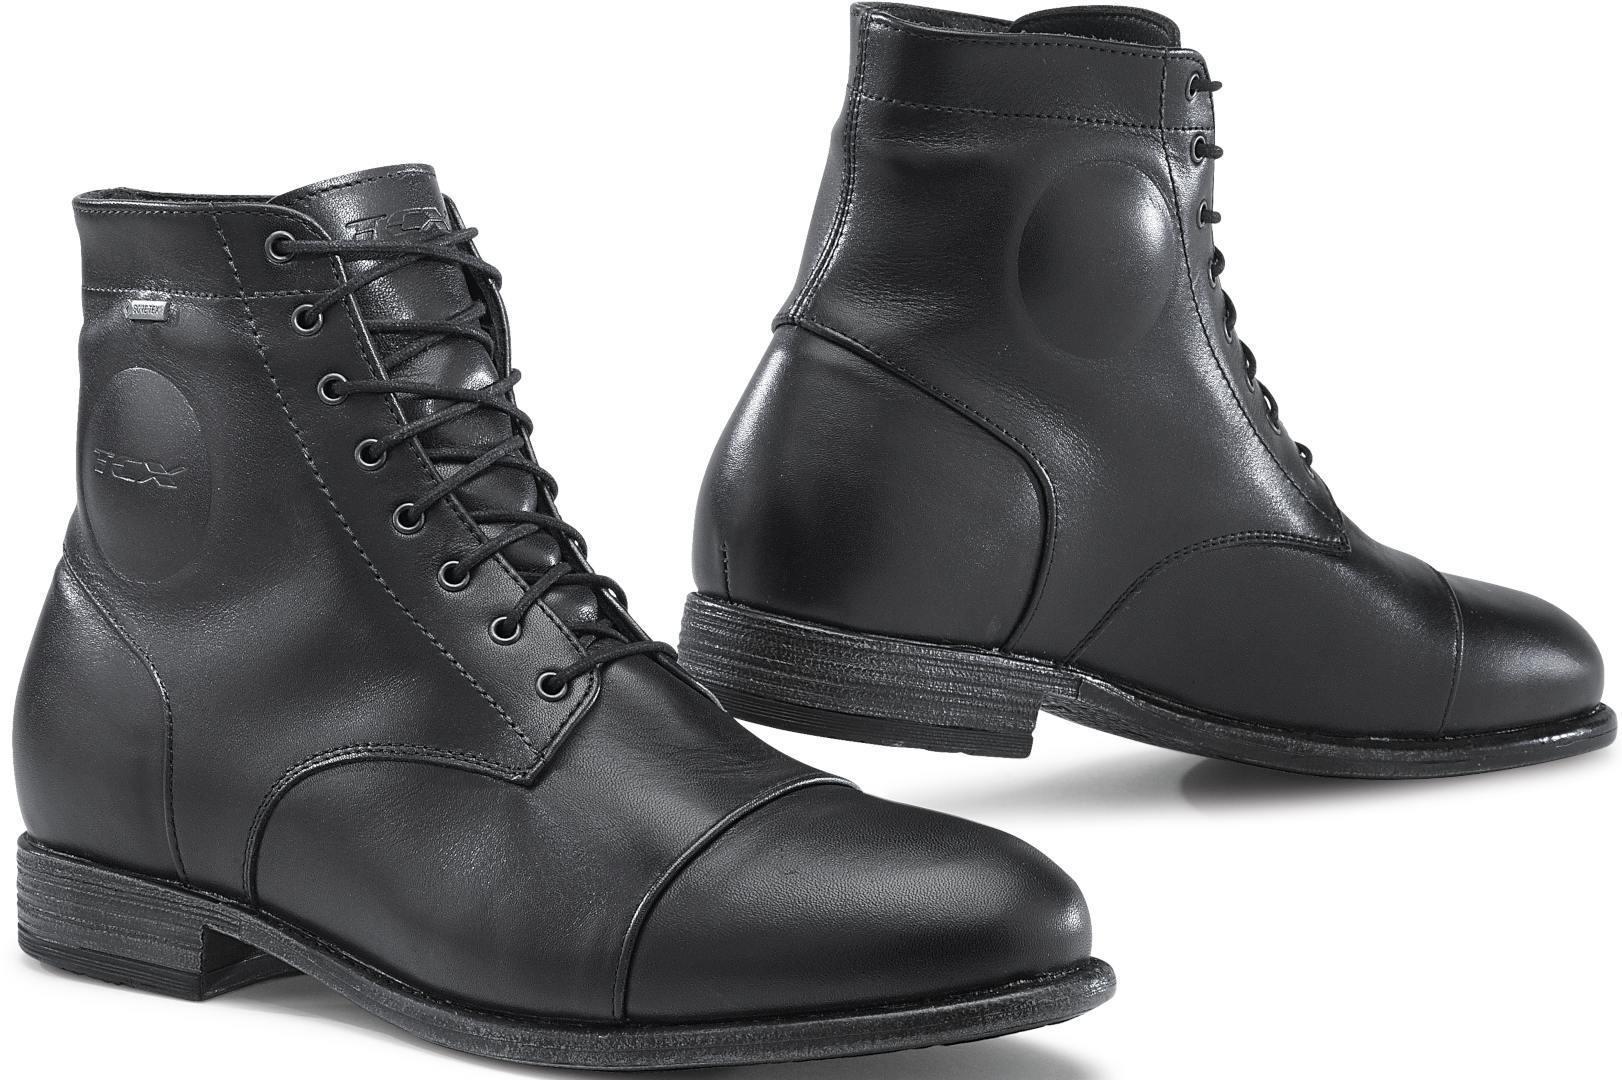 TCX Metropolitan Gore-Tex Motorcycle Boots unisex Black Size: 39